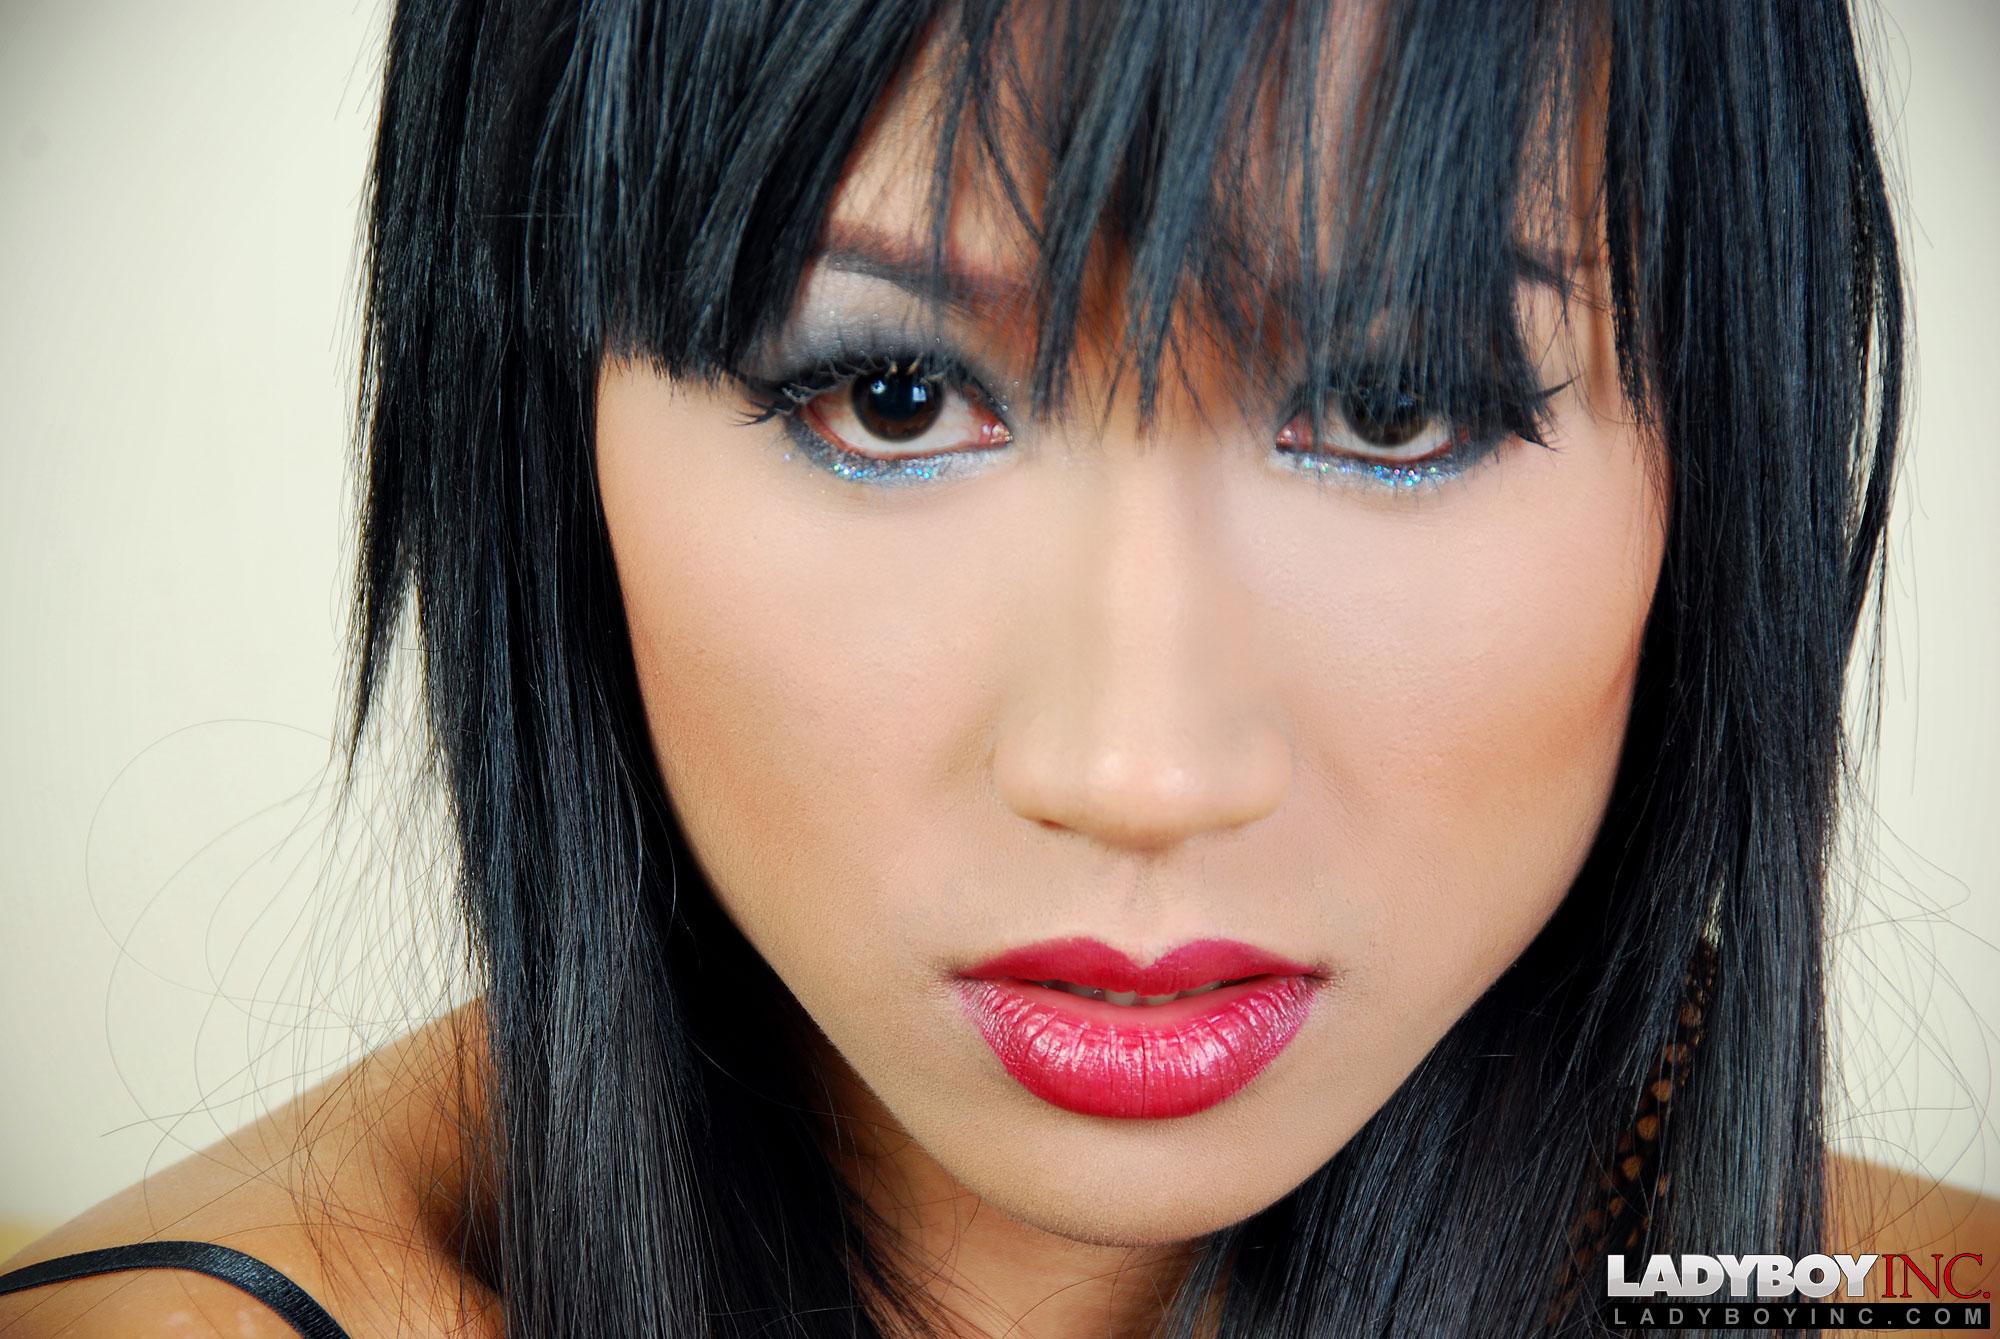 My Ladyboy Lover, Kae – So Many Ladyboys So Little Time